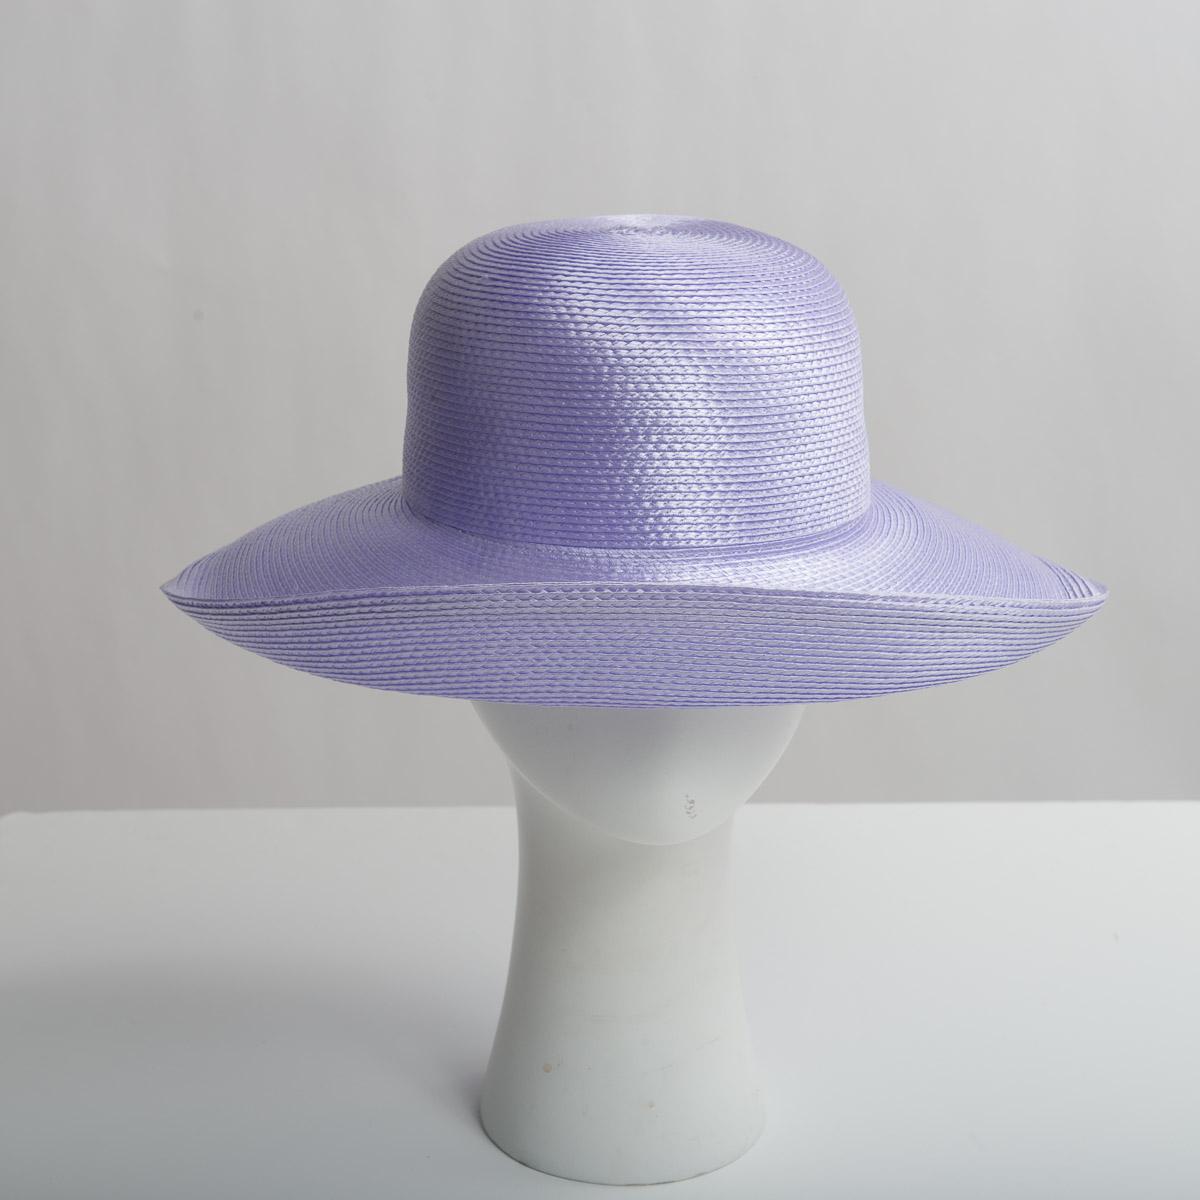 34288811043e37 Lilac Polypropylene Straw Medium Brim Plain Hats-CK01R-0-03- Sun Yorkos |  Zoria